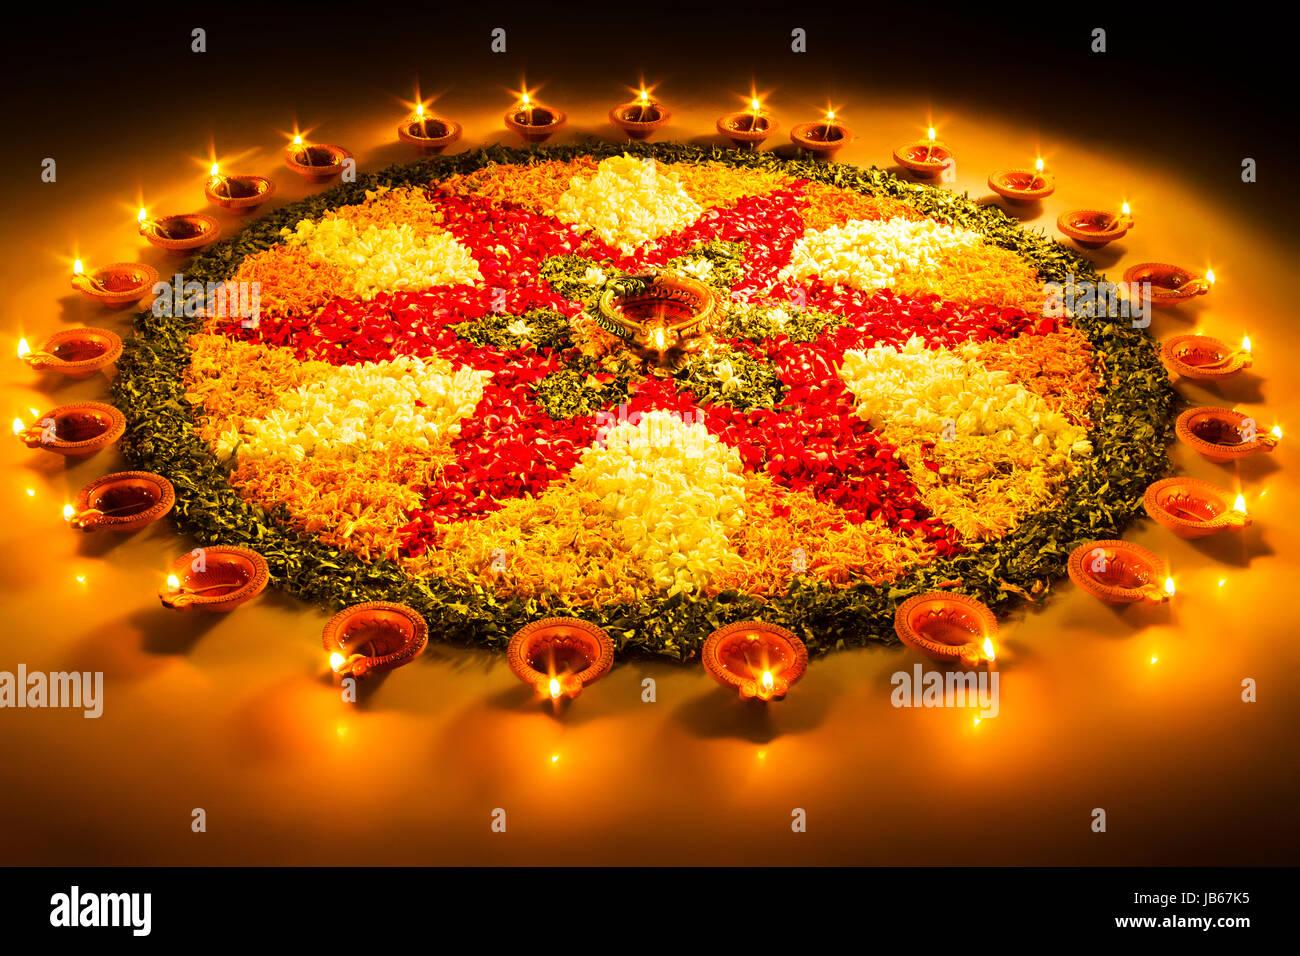 Deepavali Festival Lighting Diya Rangoli Design Celebration